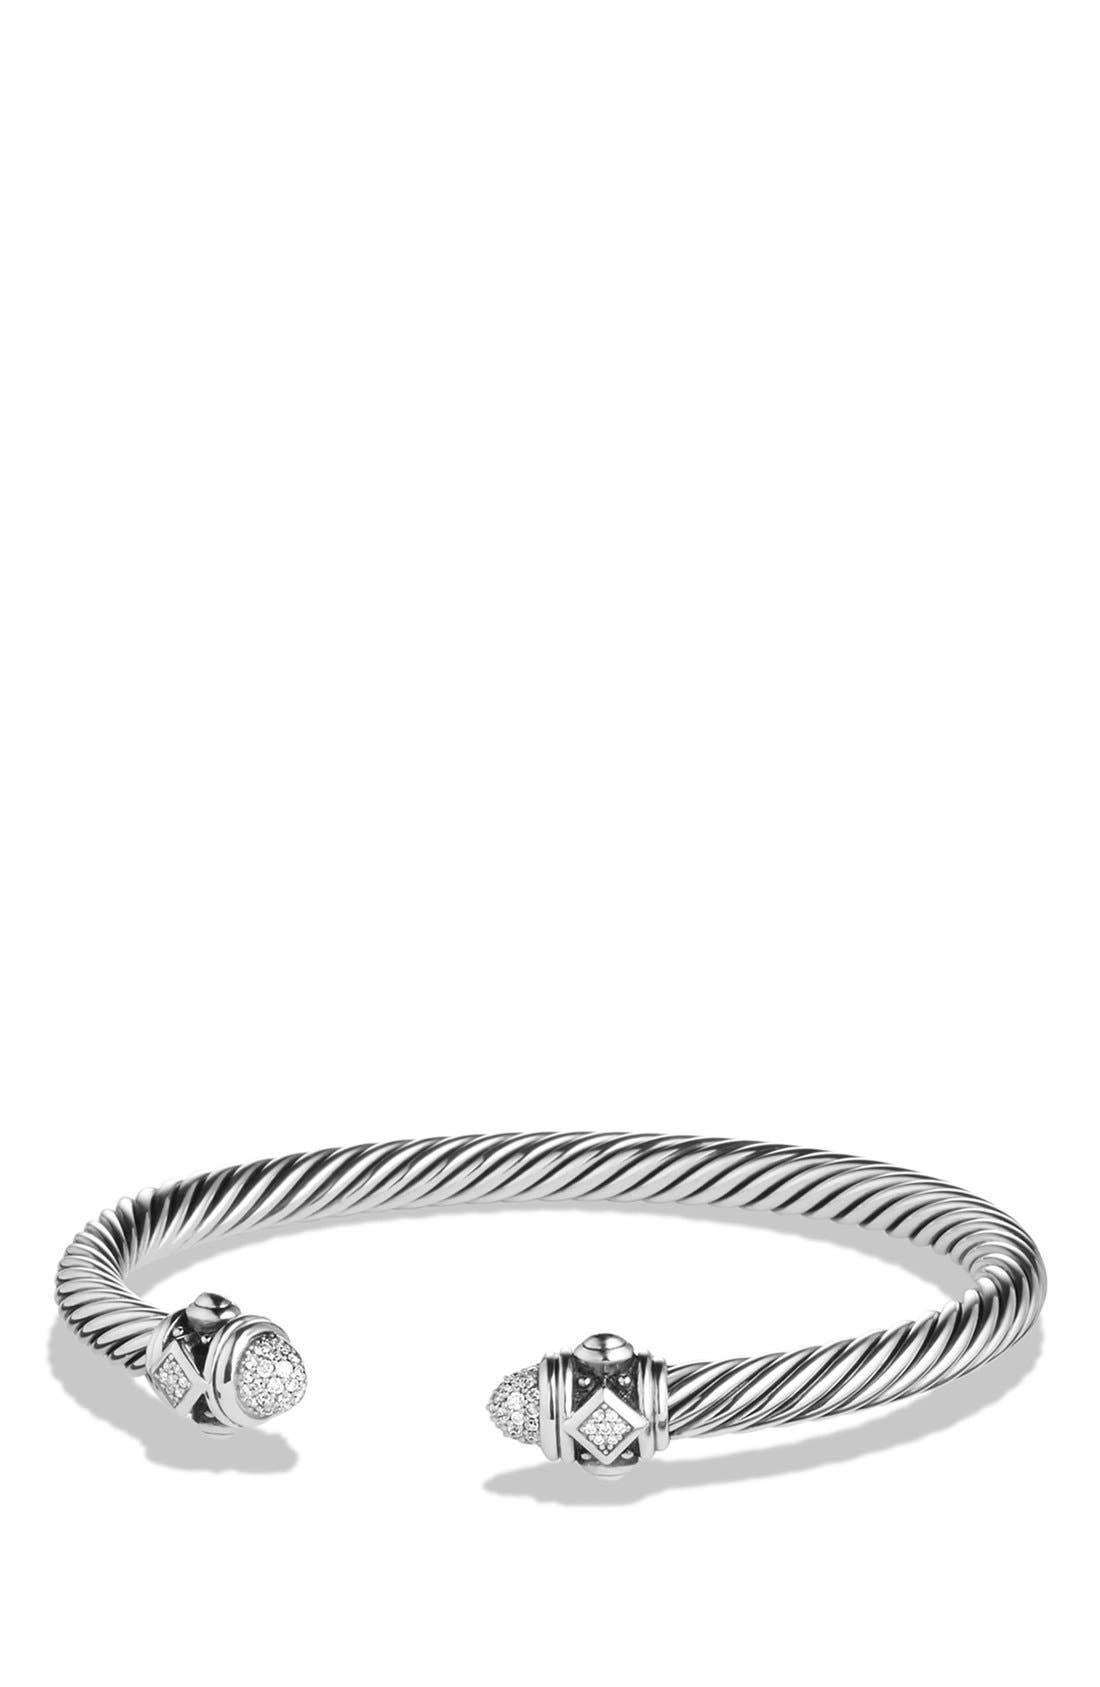 Renaissance Bracelet with Diamonds in Silver, 5mm,                             Main thumbnail 1, color,                             DIAMOND